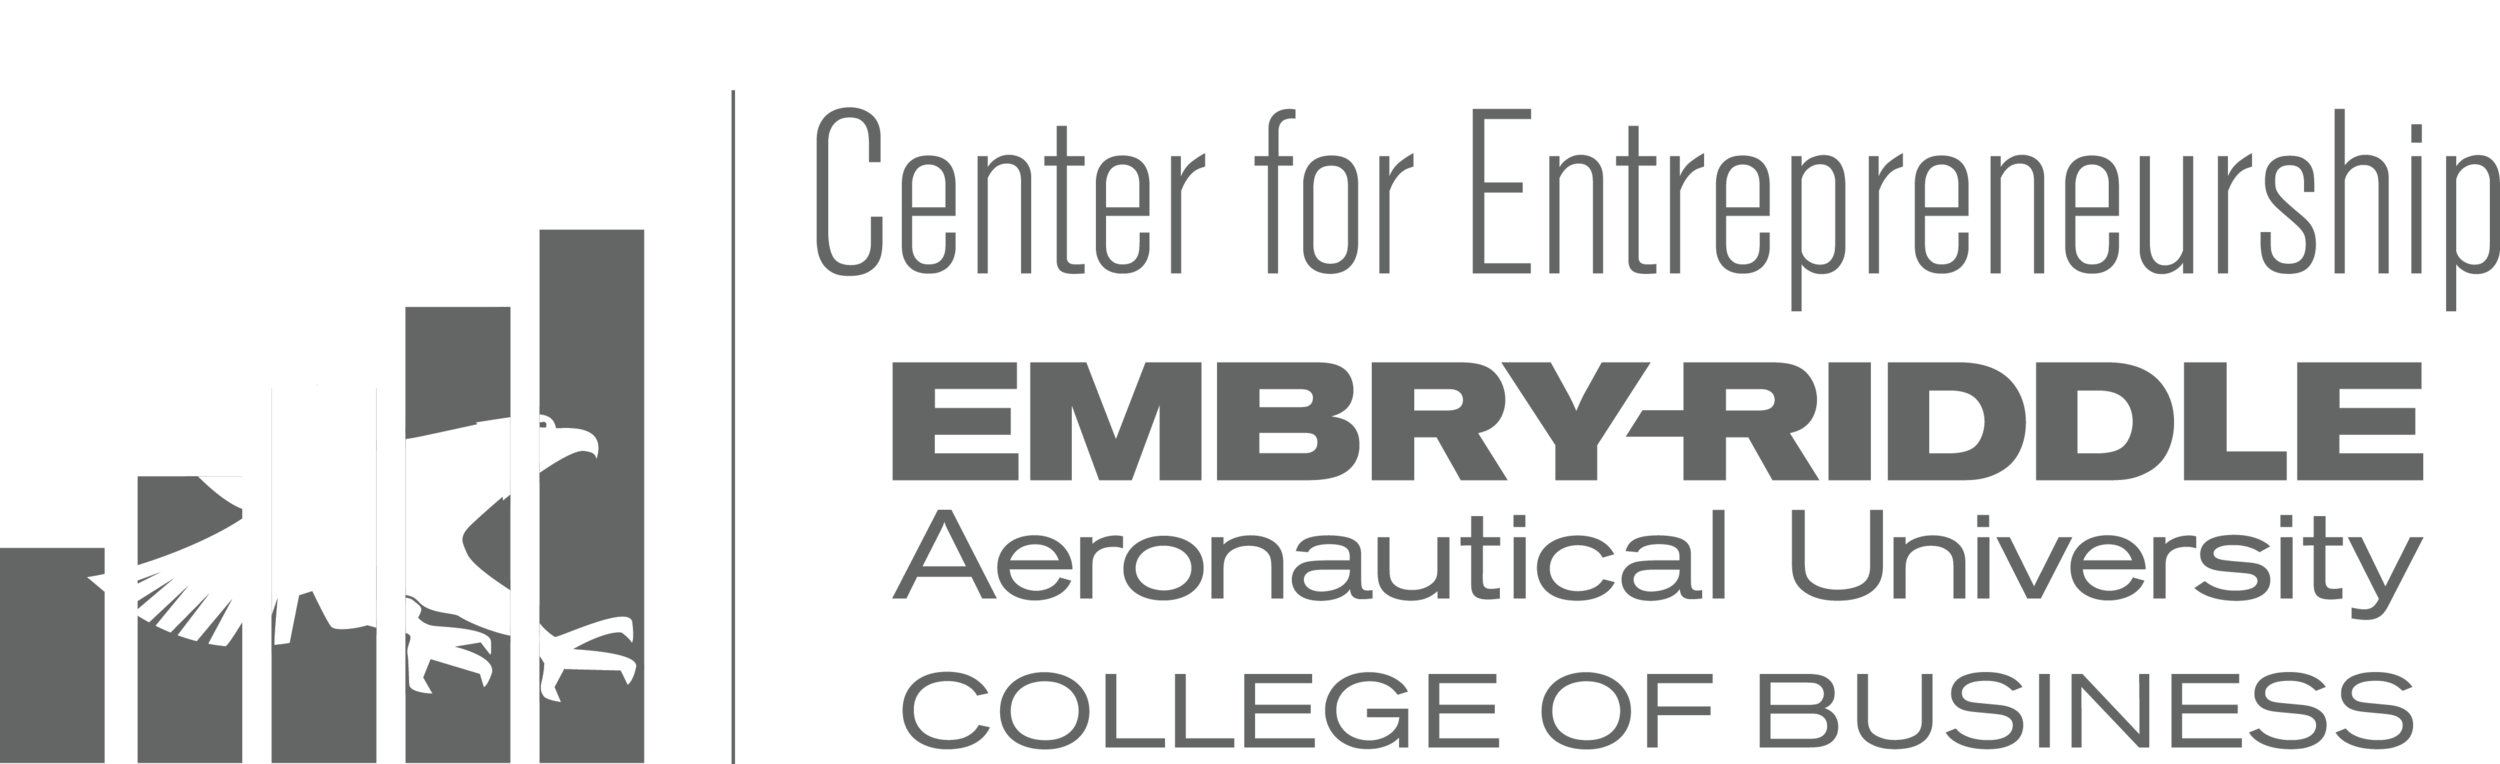 CenterForEntrepreneurship_Logogrey.png